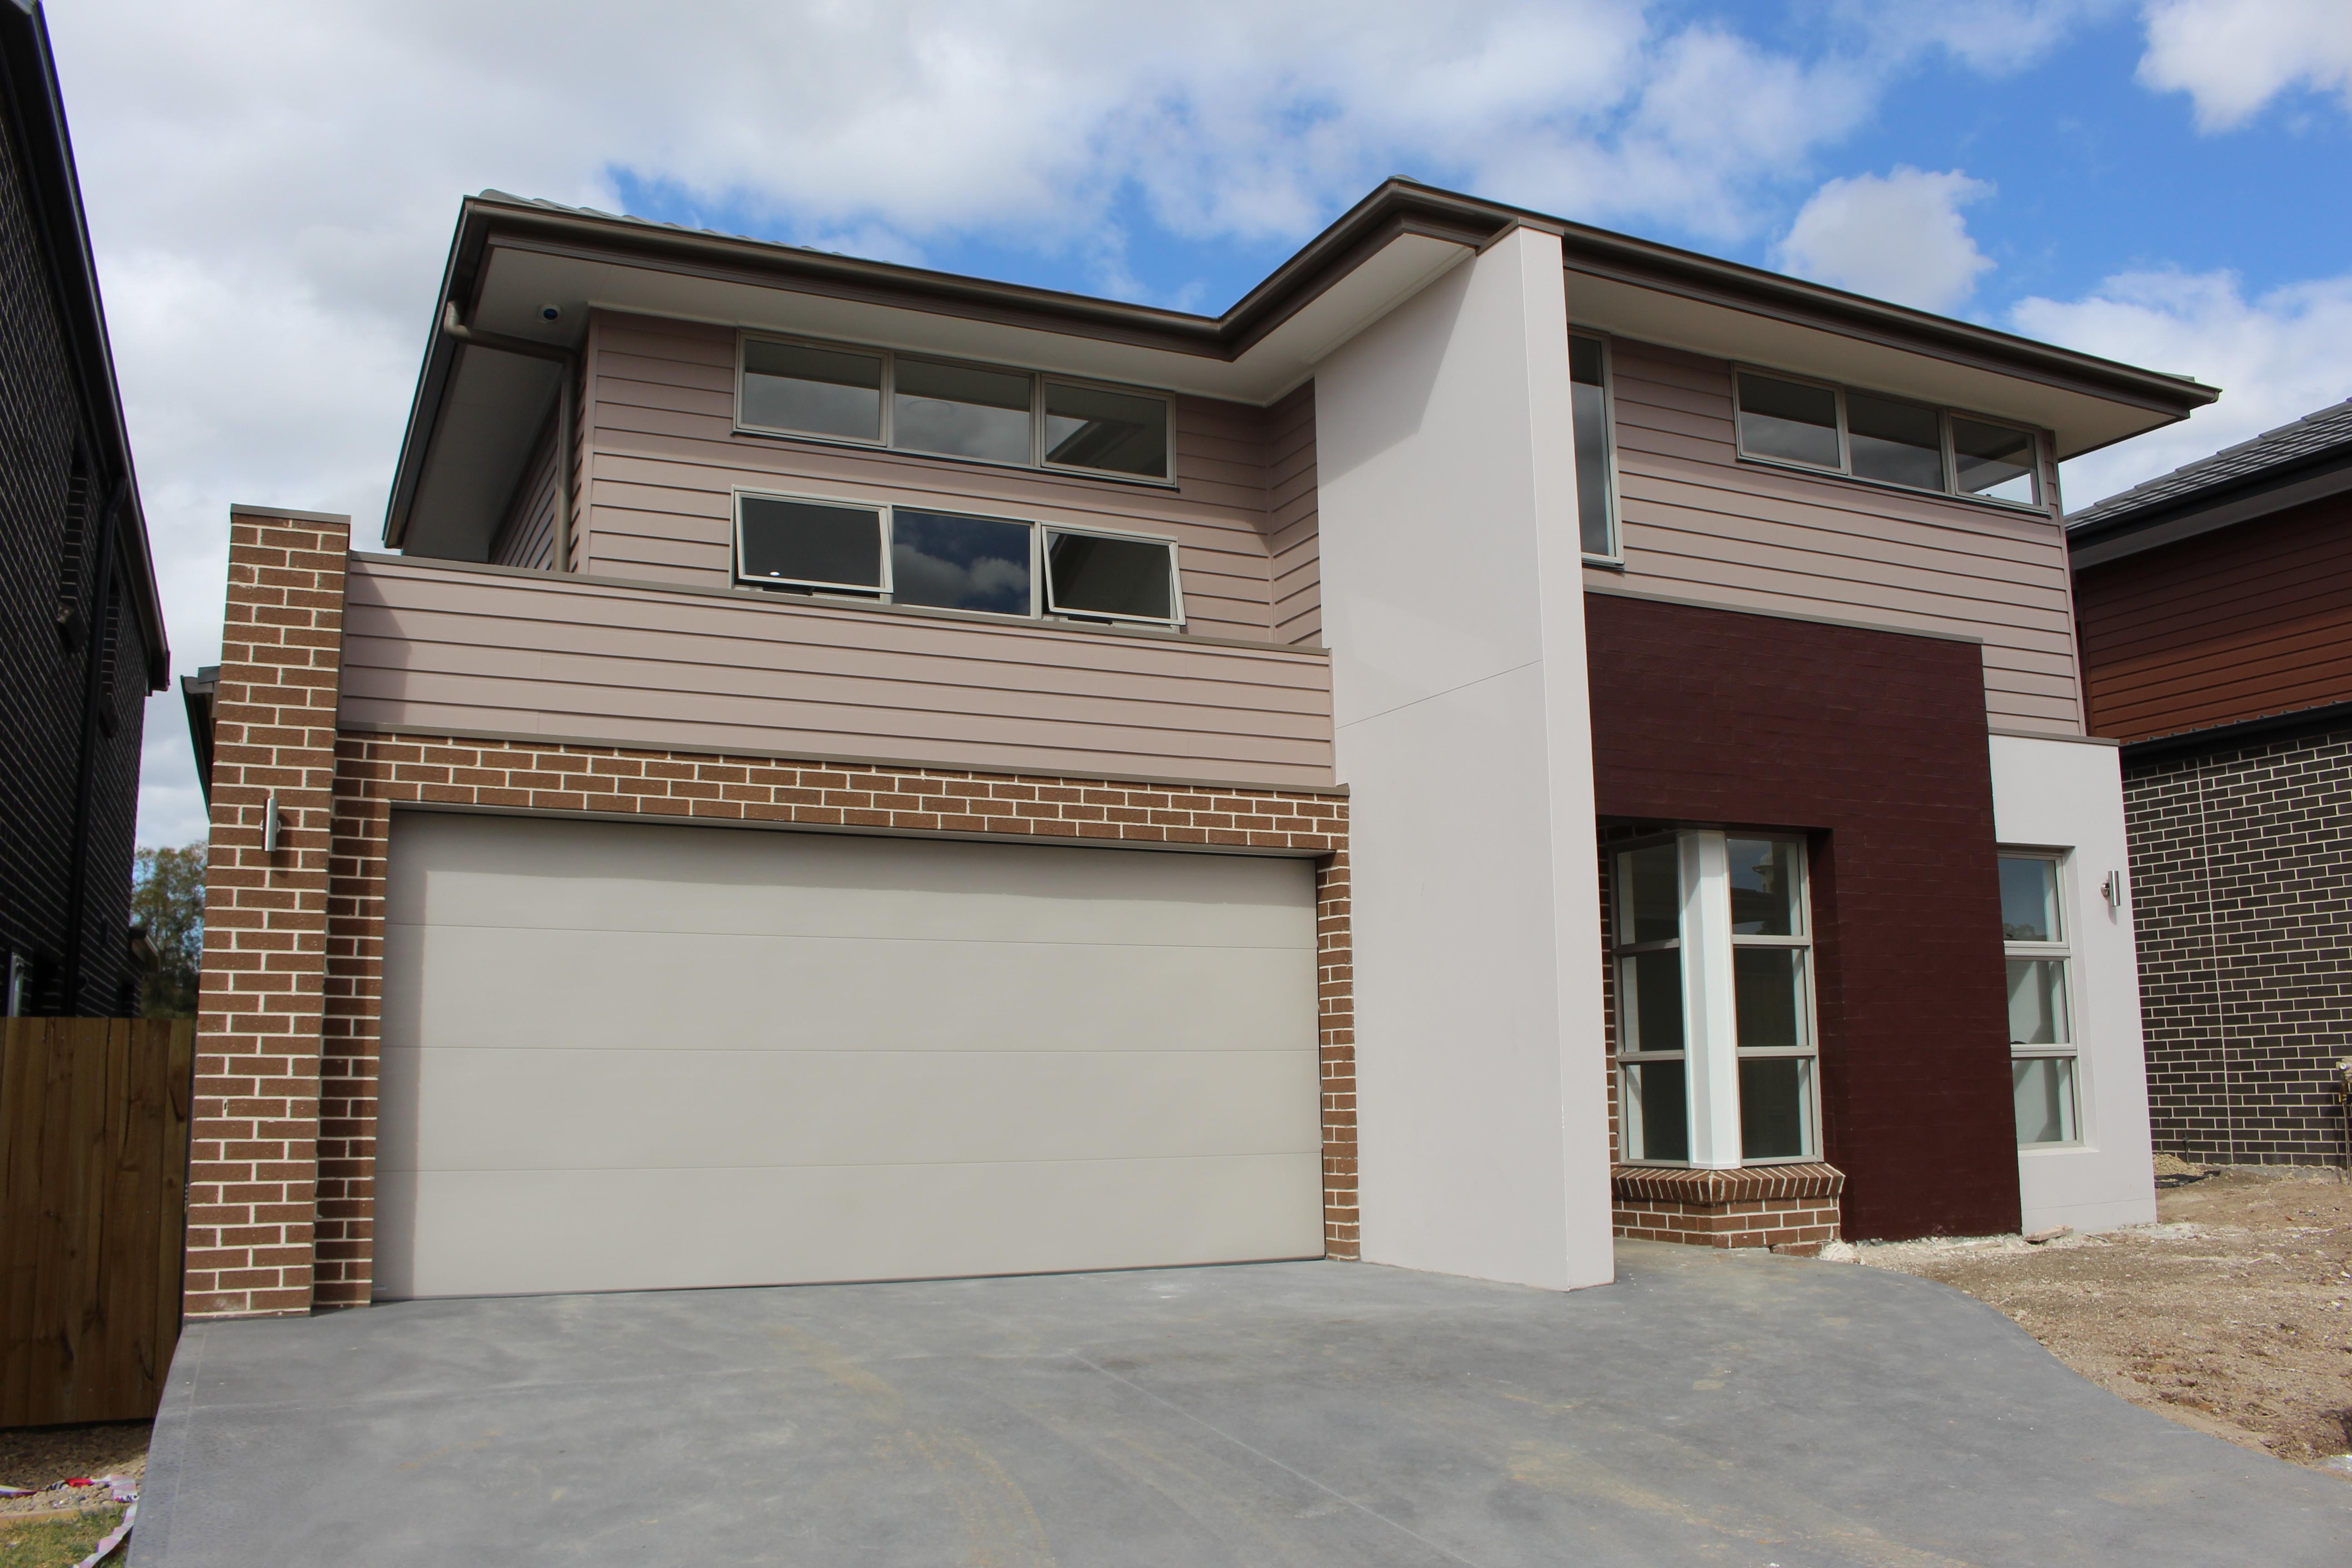 House for rent COLEBEE NSW 2761   myland.com.au